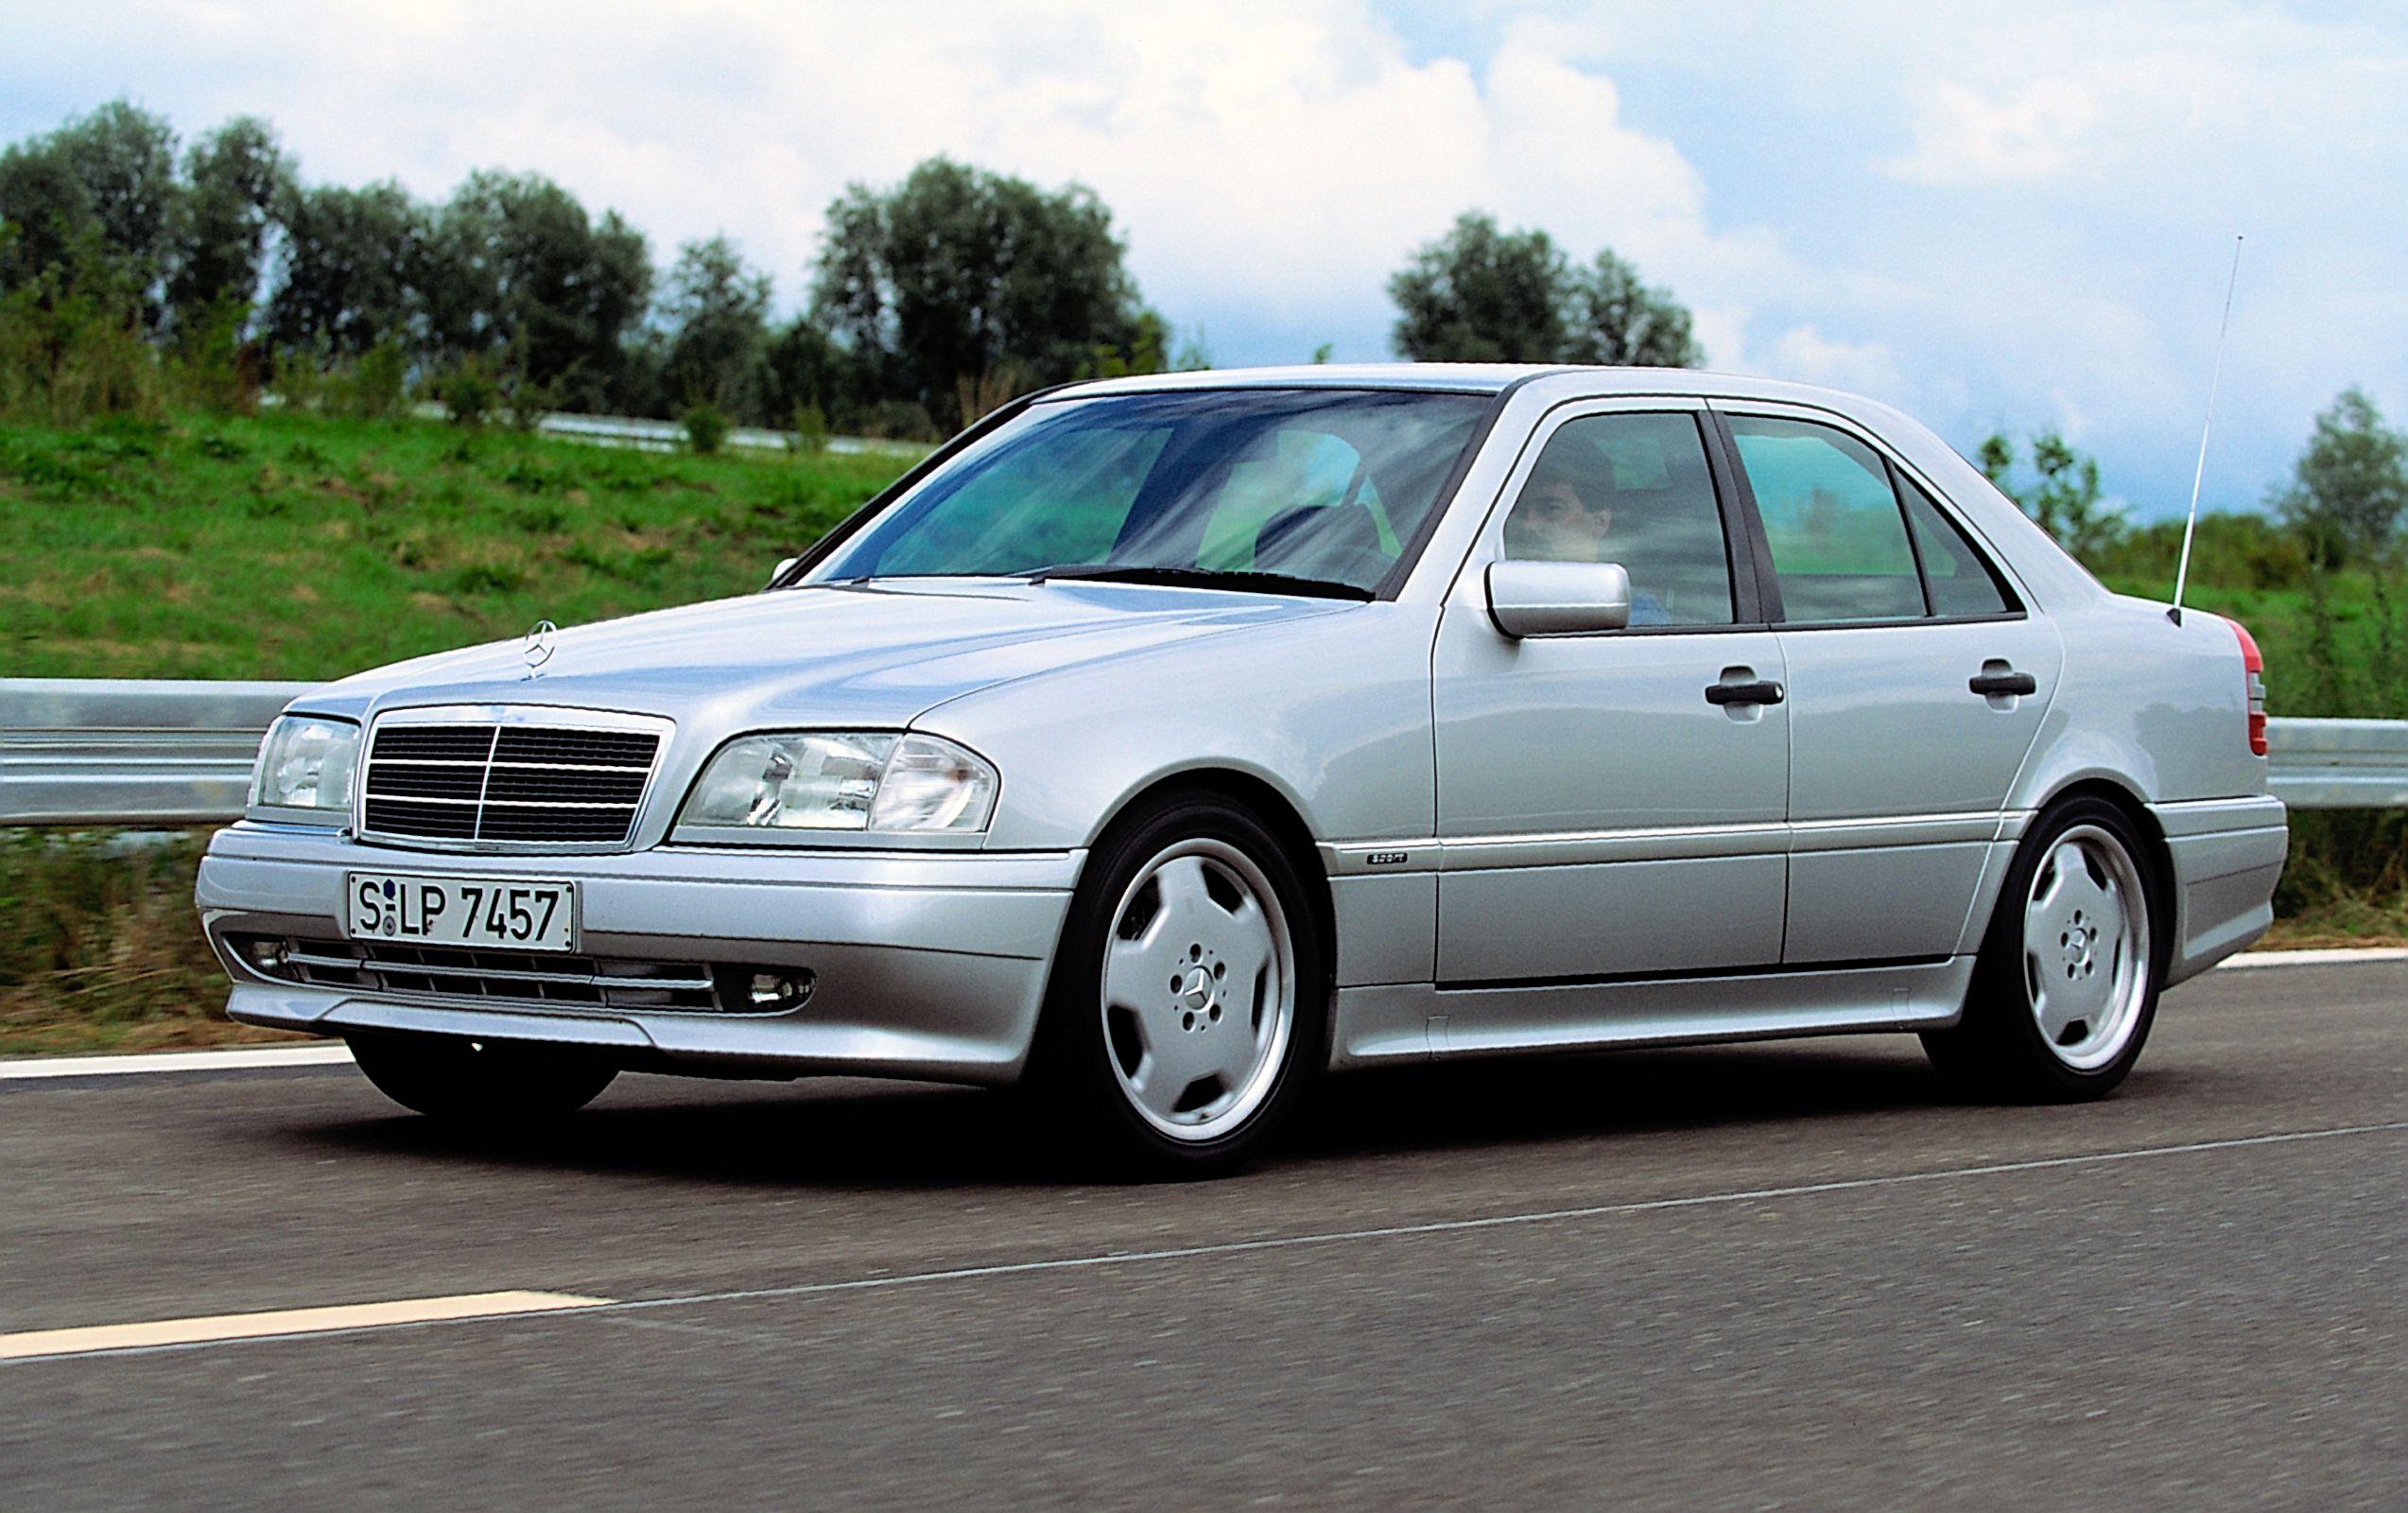 Mercedes-Benz C36 AMG tinha motor V6 3.6